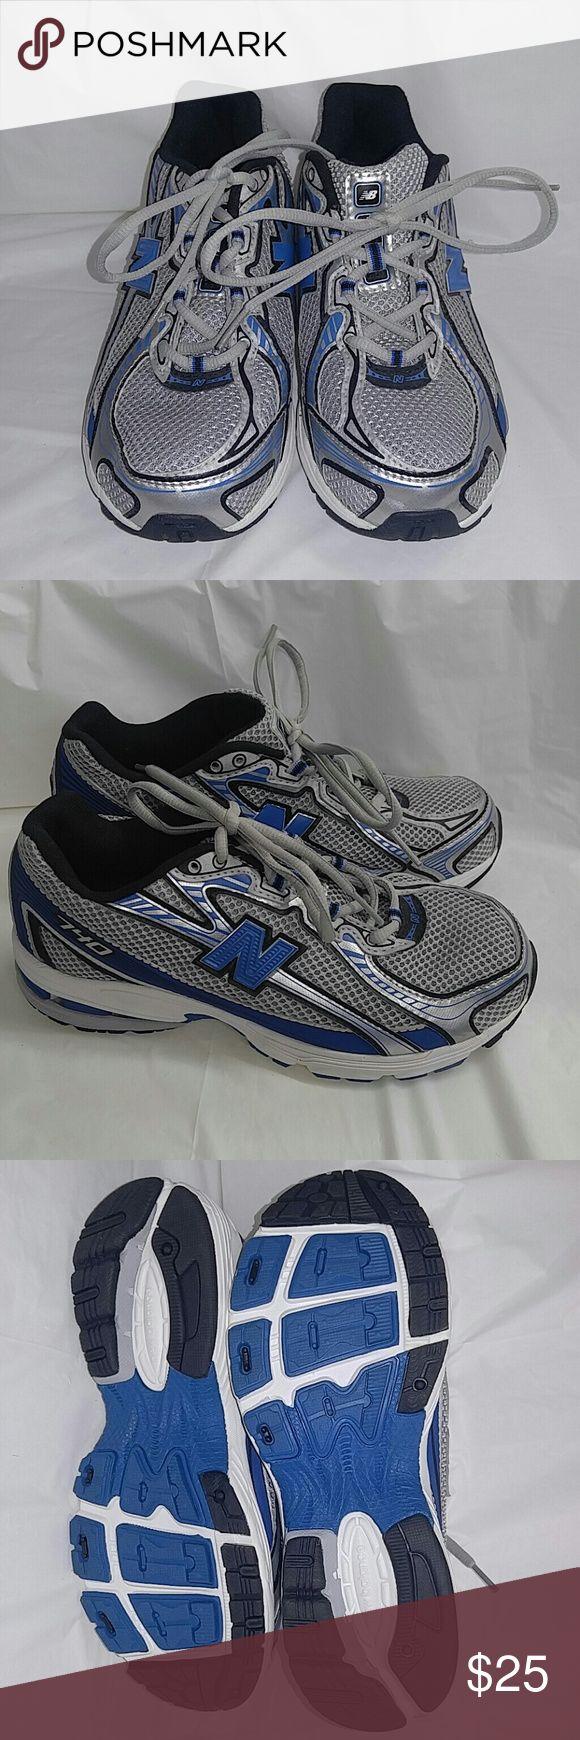 New Balance 740 Boys size 4.5 NWOT New Balance 740 Boys shoes size 4.5. New Balance Shoes Sneakers